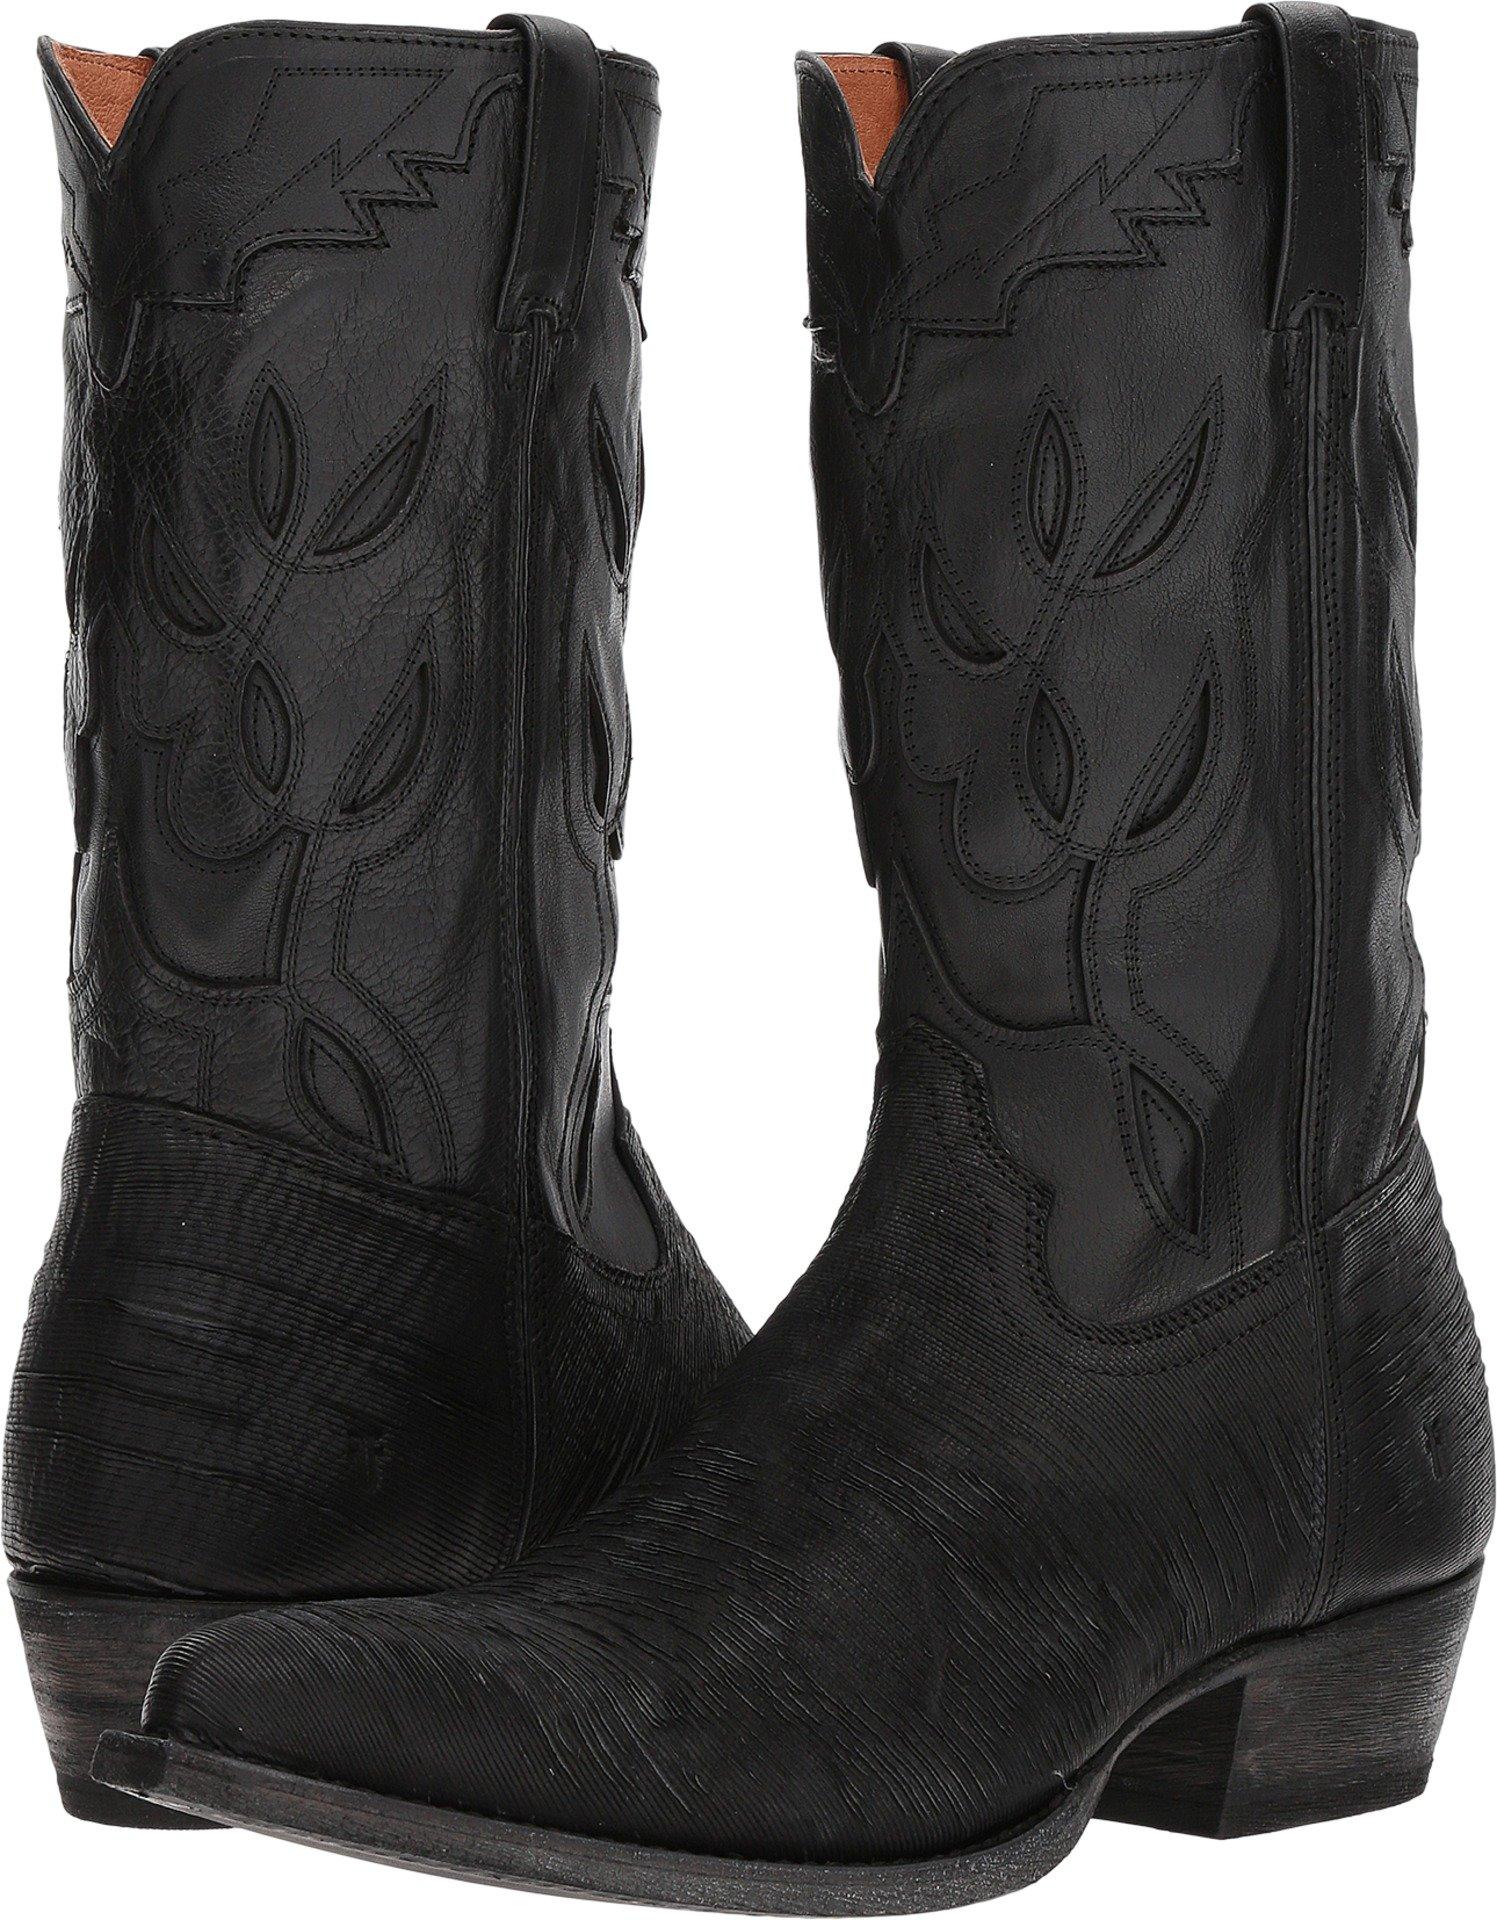 FRYE Men's Cheyenne 11L Black Multi Cut Vintage Leather/Full Grain Brush-Off 9.5 D US